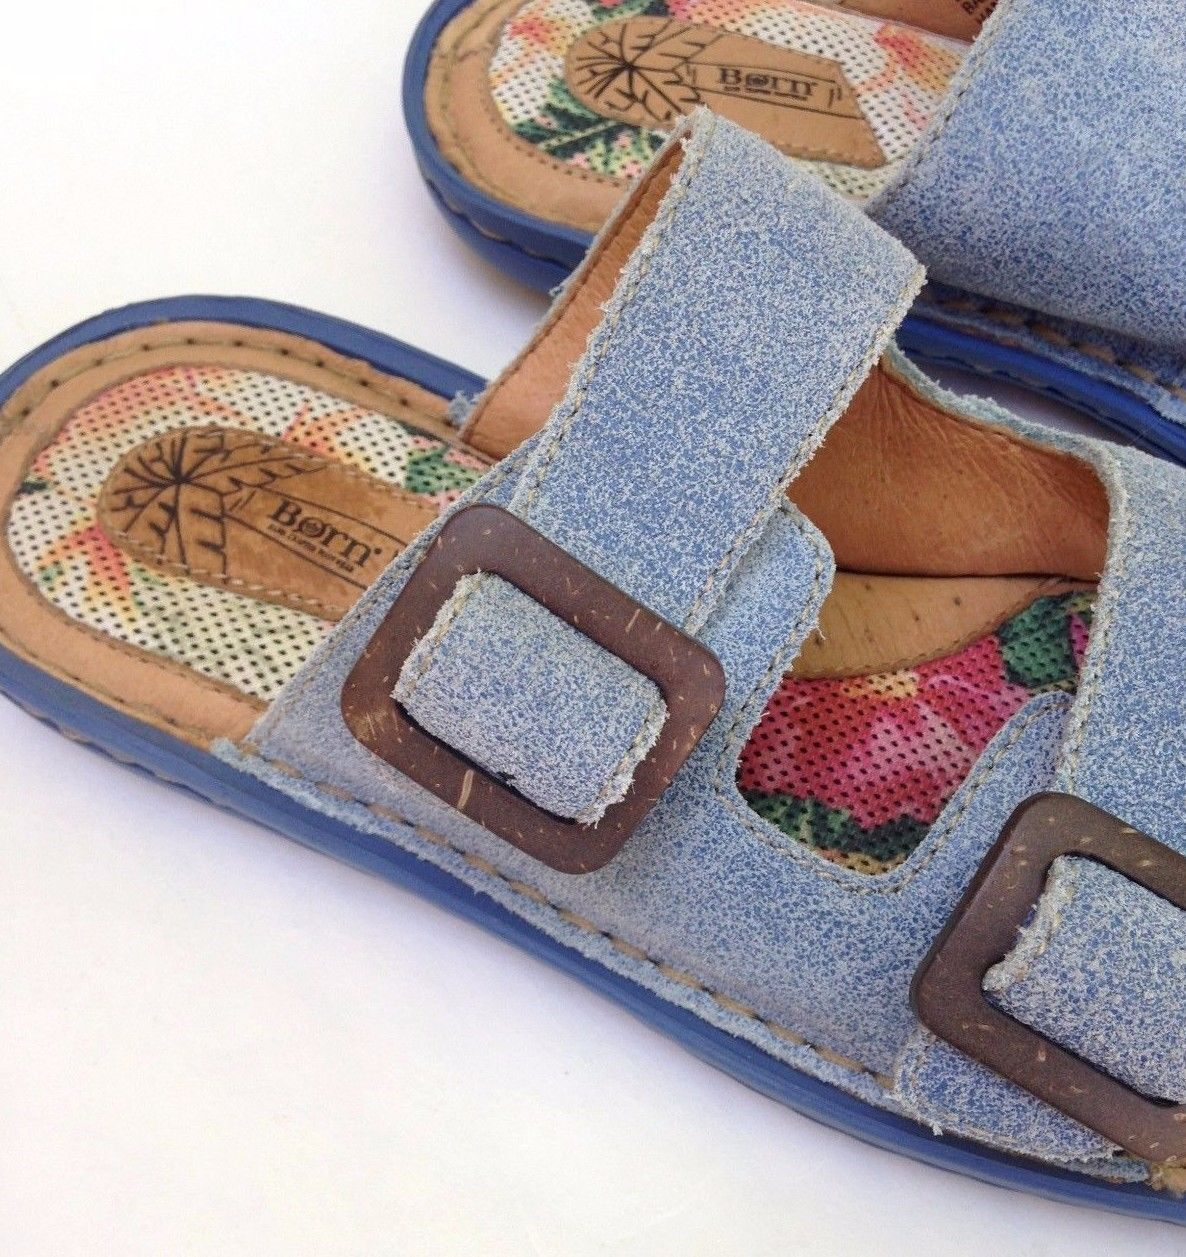 7bbc31fbc816b BORN SANDALS WOMENS Blue SUEDE Flat Comfort Padded Slides Shoes 36 US 5.5 -  6